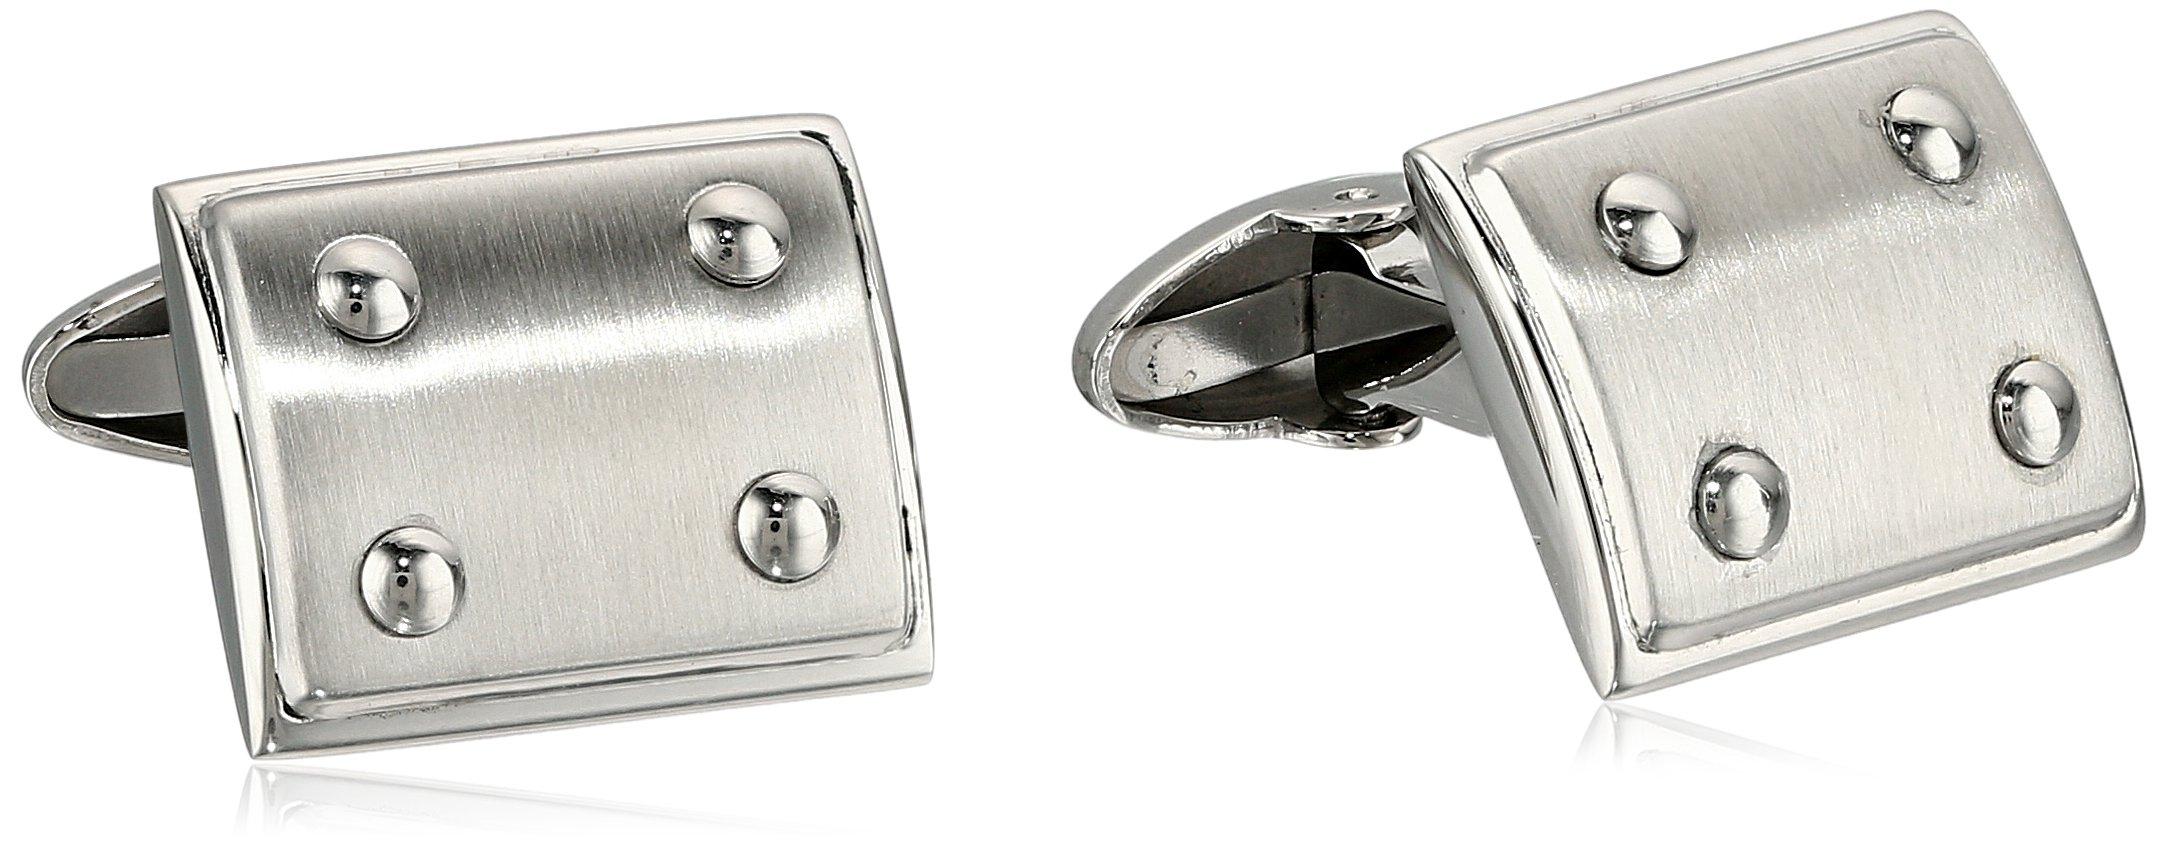 Cold Steel Stainless Steel Cufflinks